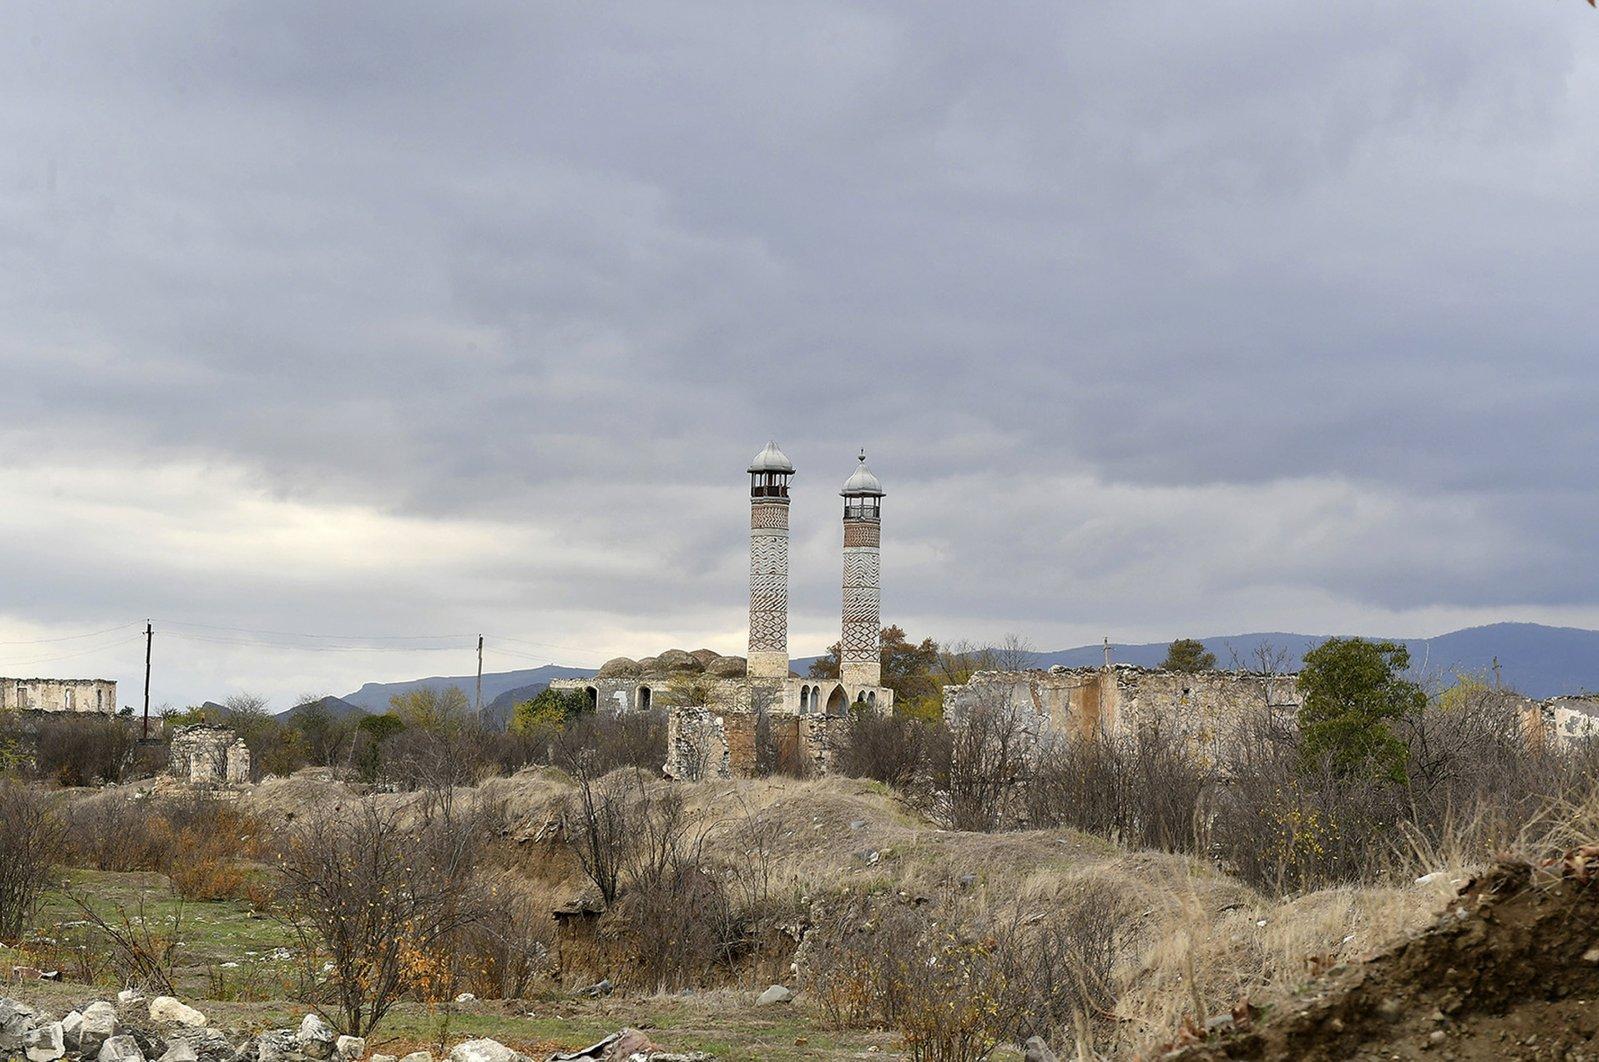 The Aghdam Mosque in Aghdam, after Armenia handed the area over to Azerbaijani forces, Nagorno-Karabakh, Nov. 23, 2020. (Azerbaijani Presidential Press Office via AP)